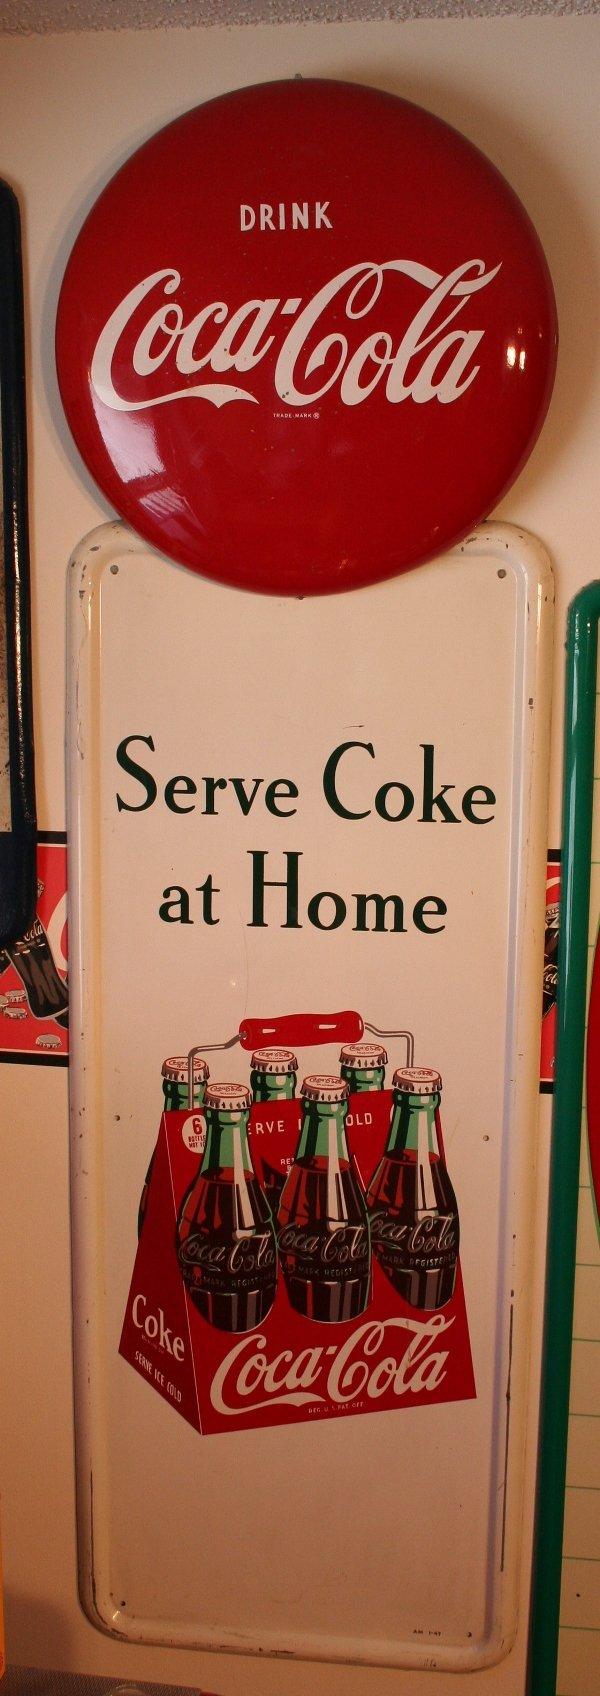 "188: Coke advertising sign ""Serve Coke at Home"""